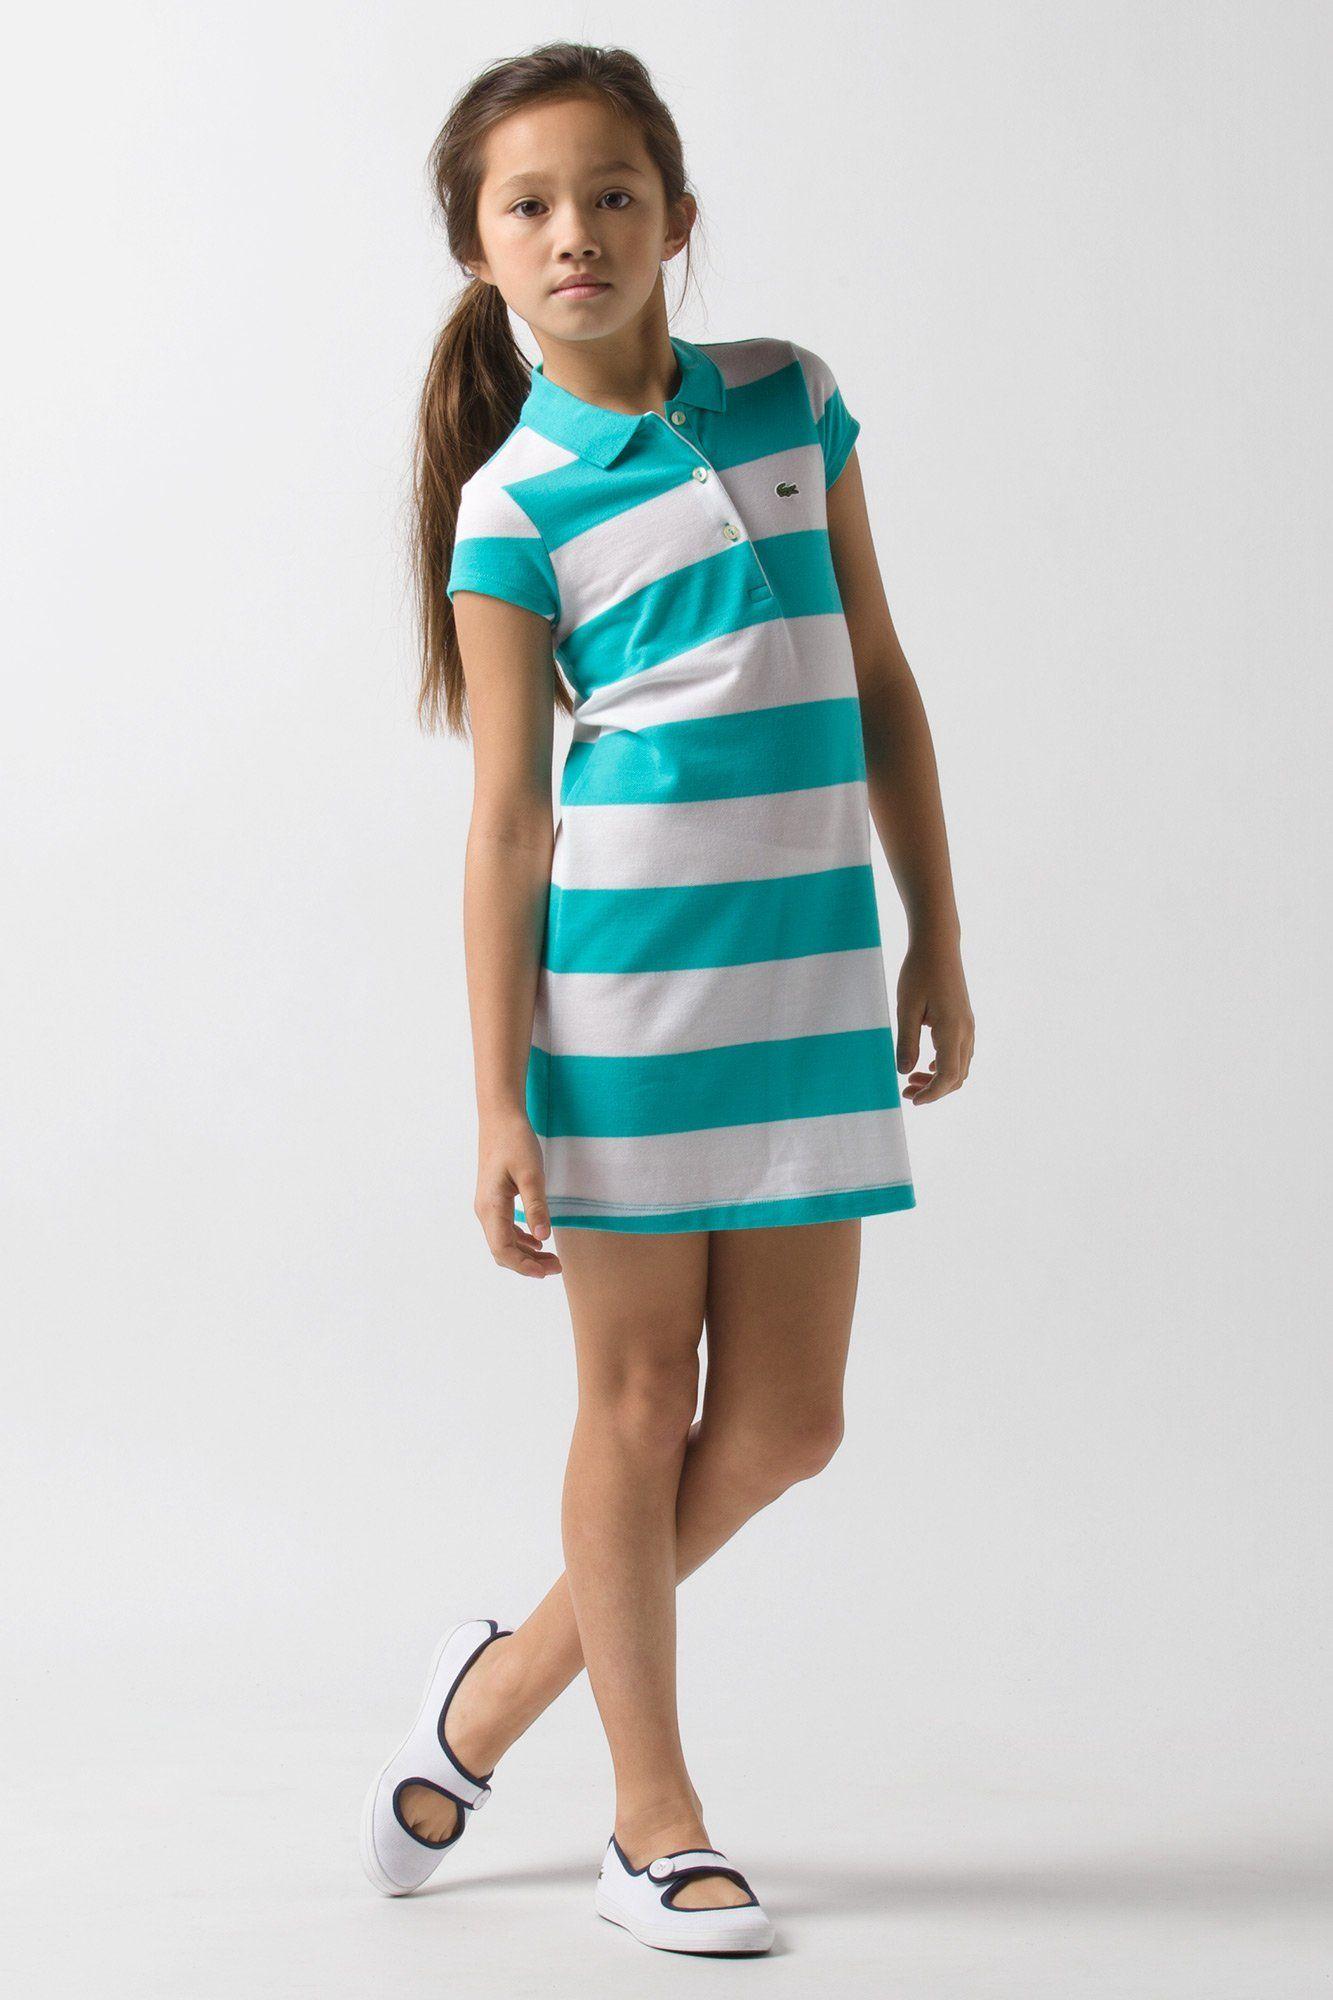 8ed791cd48802 Lacoste girls short sleeve stripe pique  dress